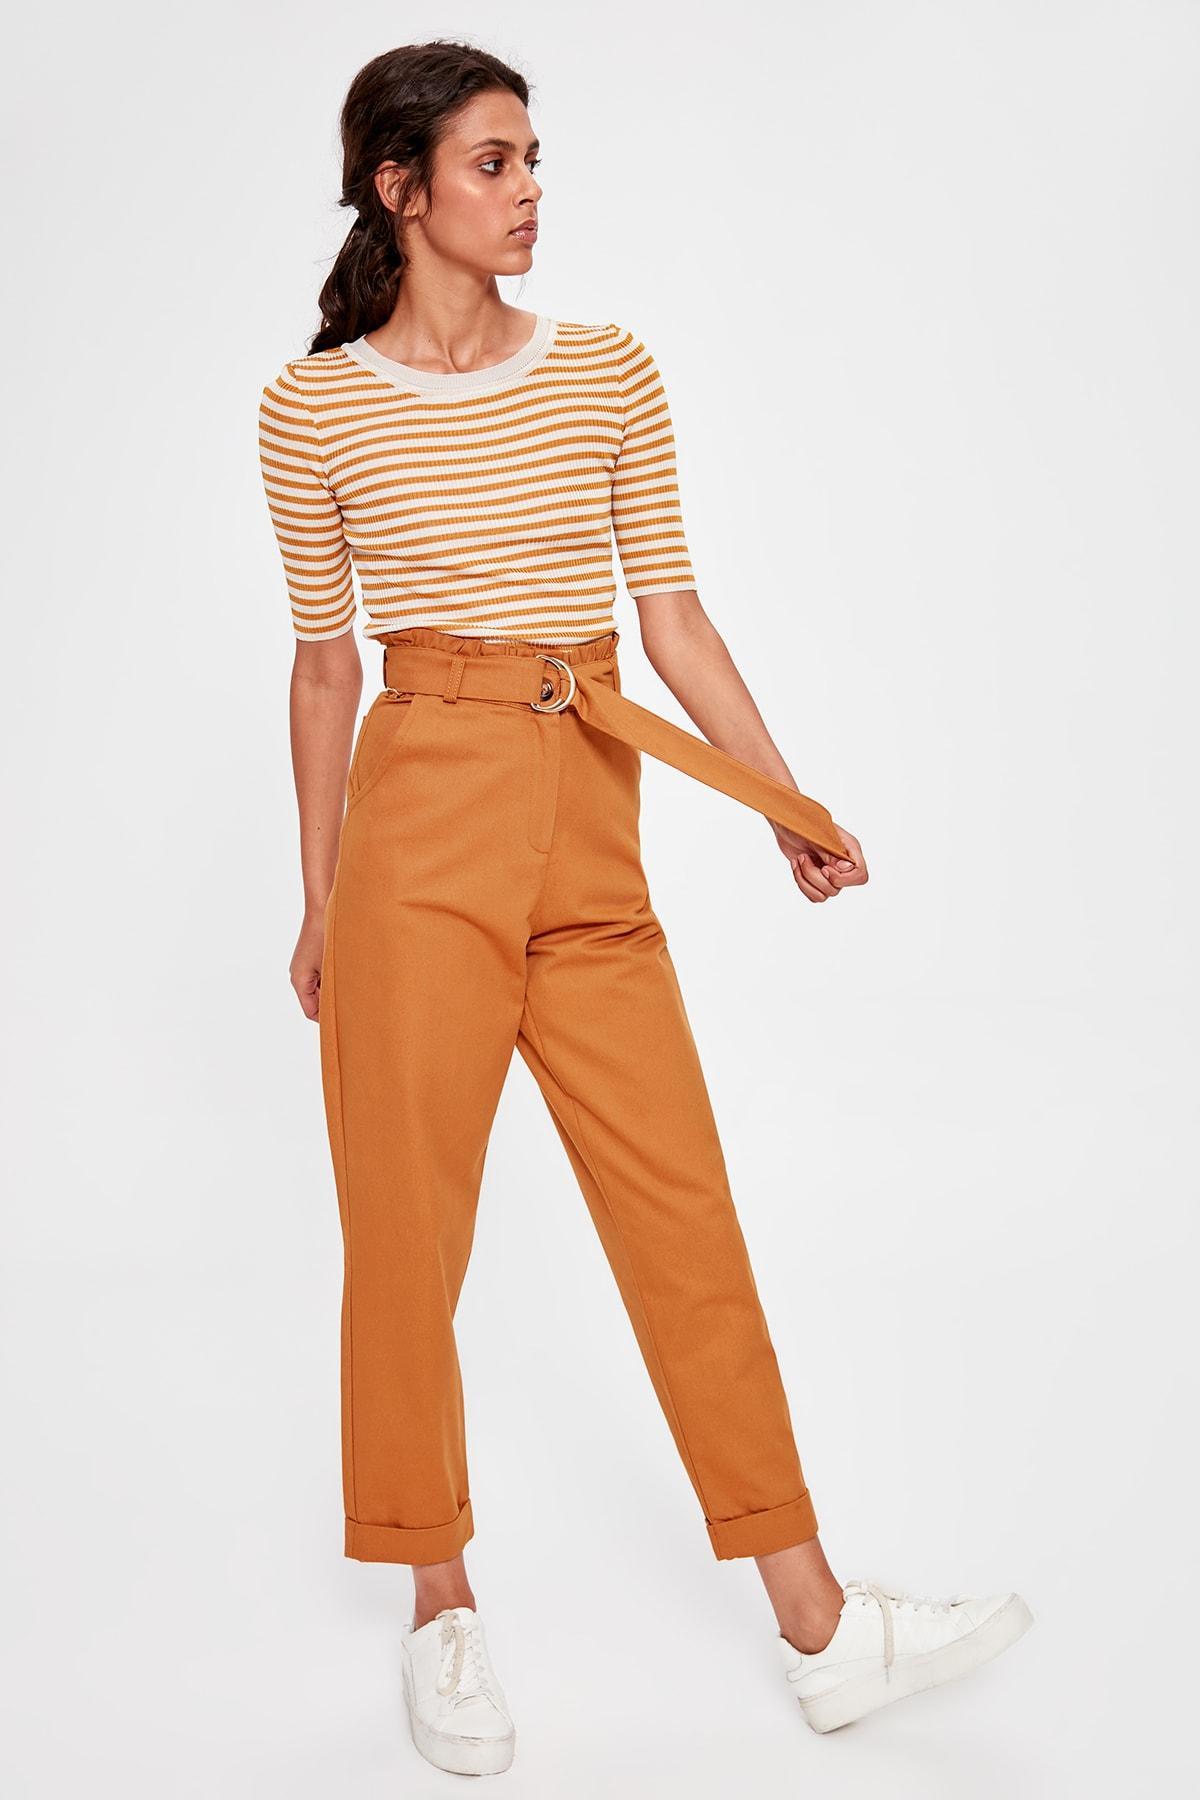 Trendyol Camel Arched Pants TWOAW20PL0051